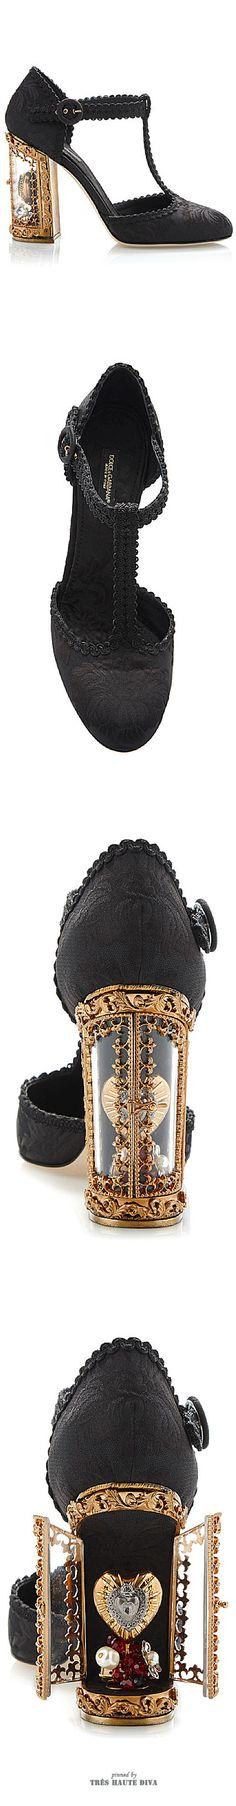 Dolce & Gabbana Black Jacquard T-Strap Mary Jane With Window Pane Pump ♔ SS 2015 ♔ Tres Haute Diva